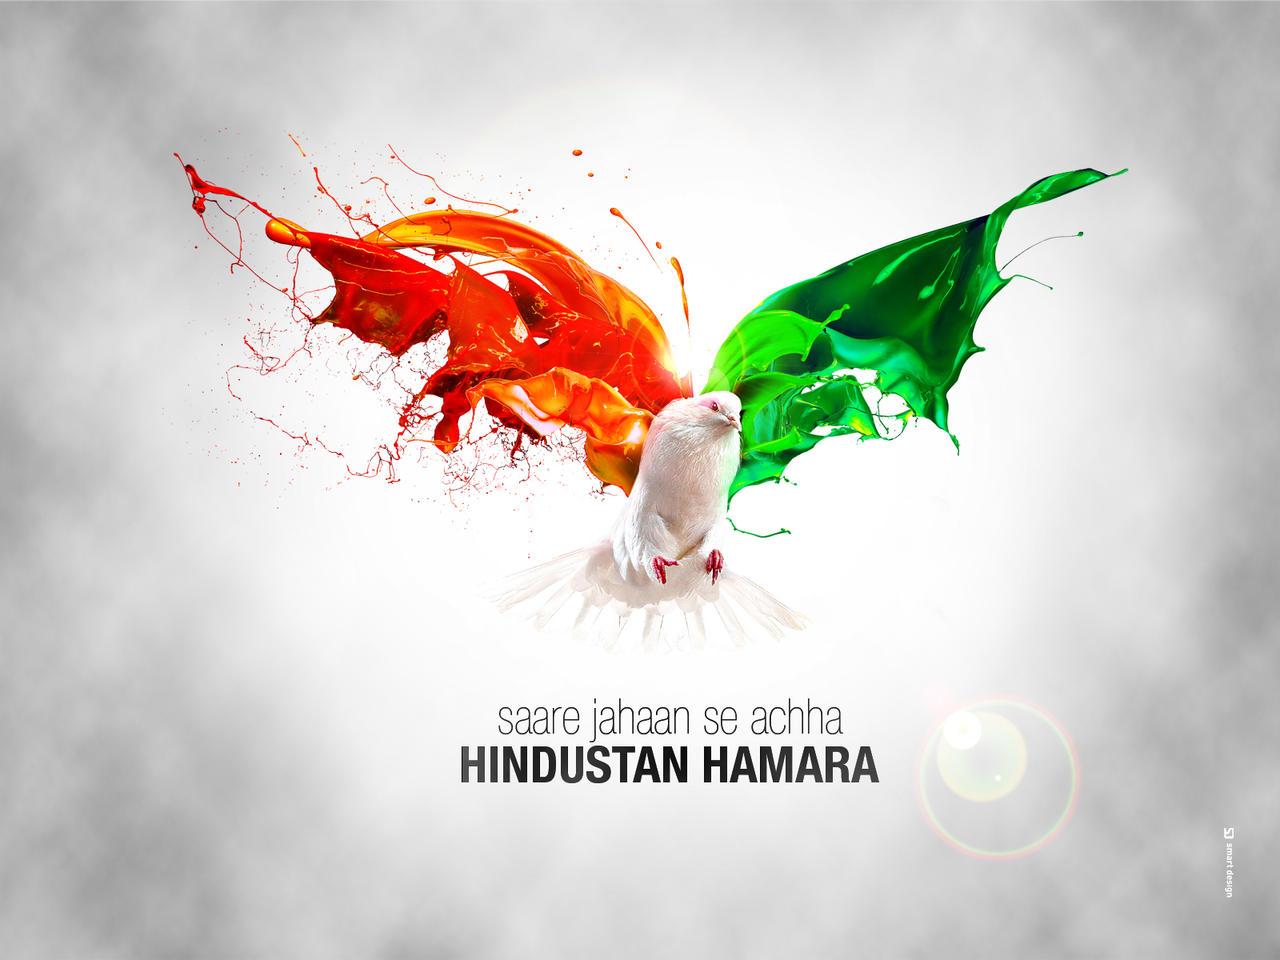 saare jahan se accha hindustan hamara Have pakistanis heard the song saare jahan se accha by  which is the raga that saare jahan se accha  hindustan hamara/muslim hain hum watan hai sara.